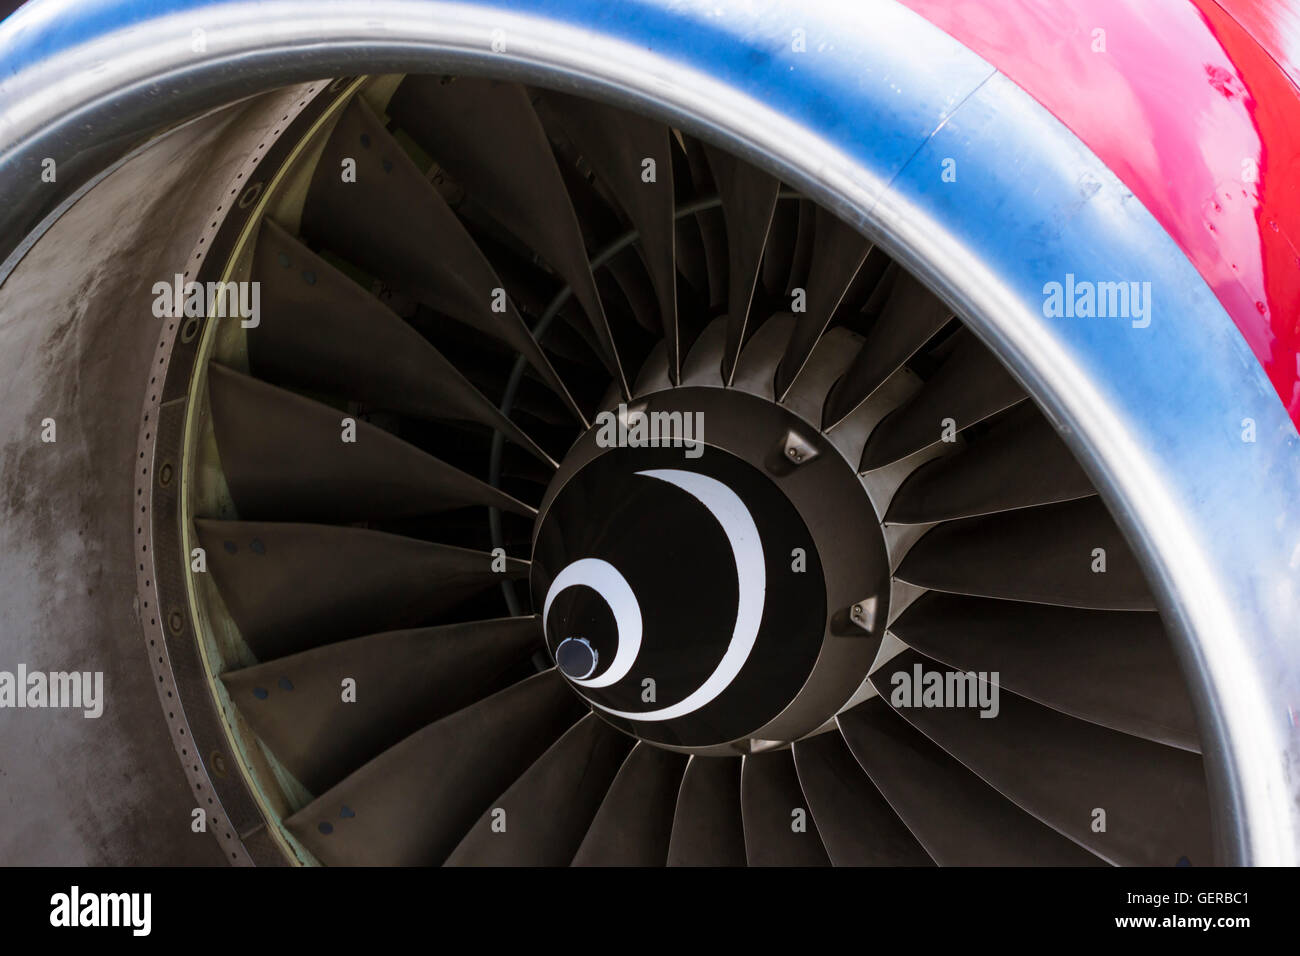 Turbine blades jet engine aircraft civil. Aircraft on pre-flight preparation at Heraklion Airport N. Kazantzakis. - Stock Image